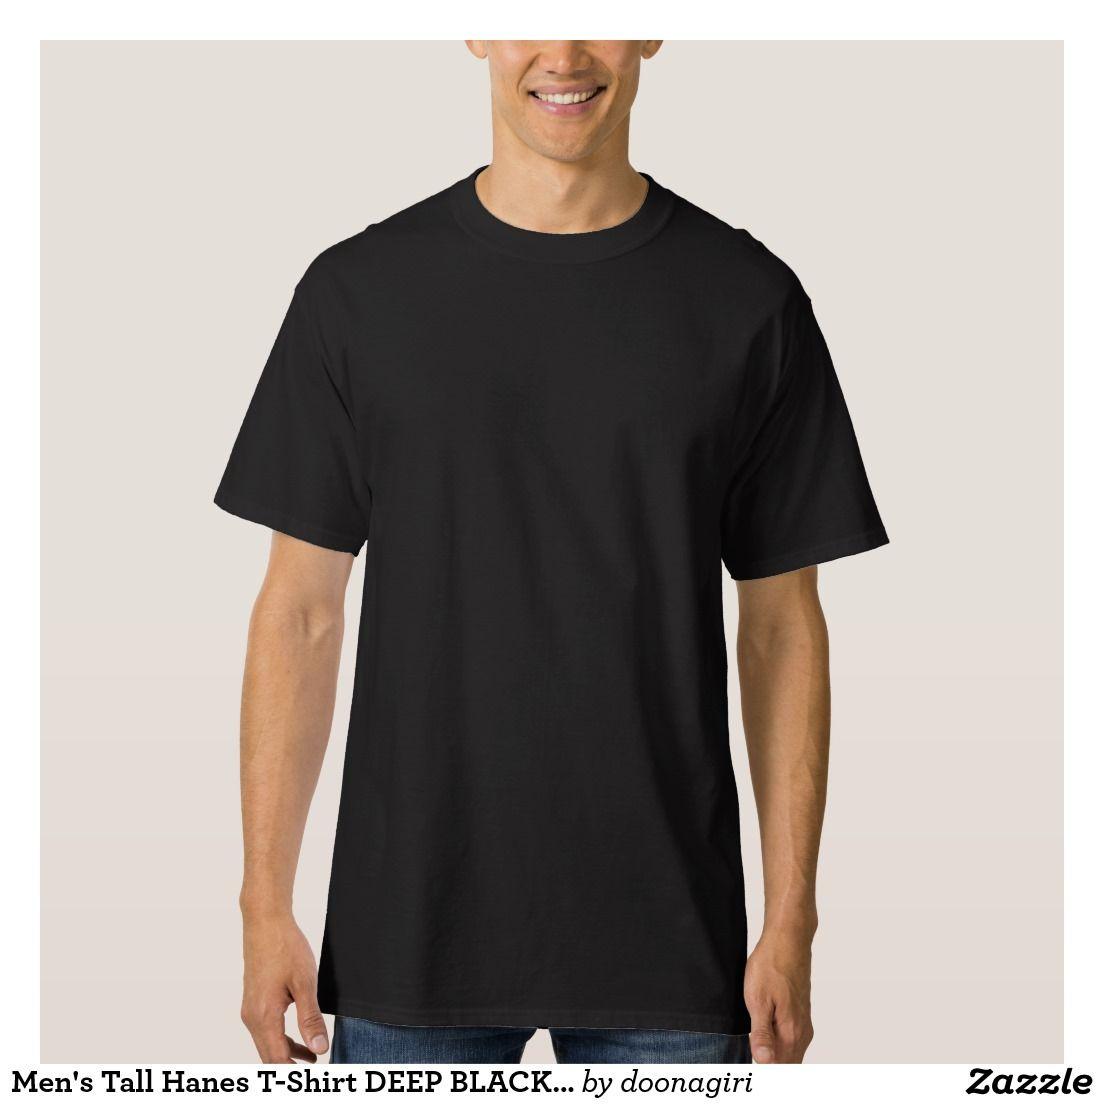 Download 49 Blank Tee Shirts Templates Ideas Tee Shirts Shirt Template Shirts